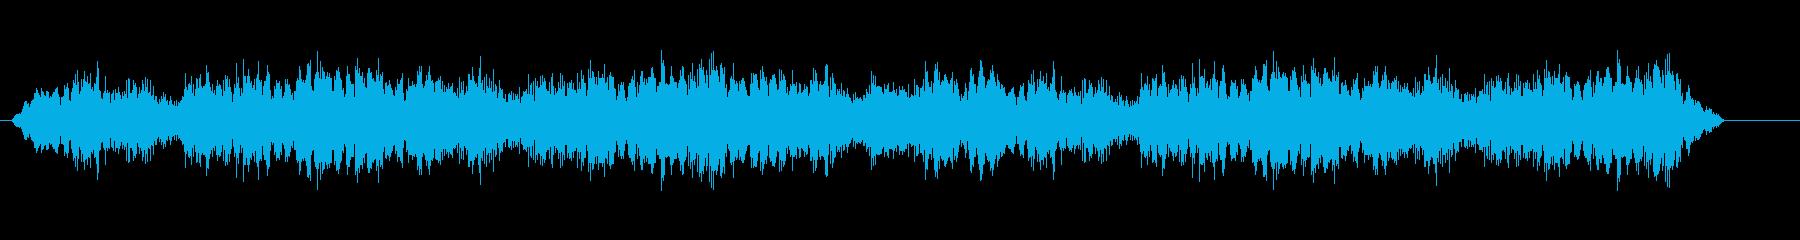 Sci Fiジェネレーター_一定の...の再生済みの波形